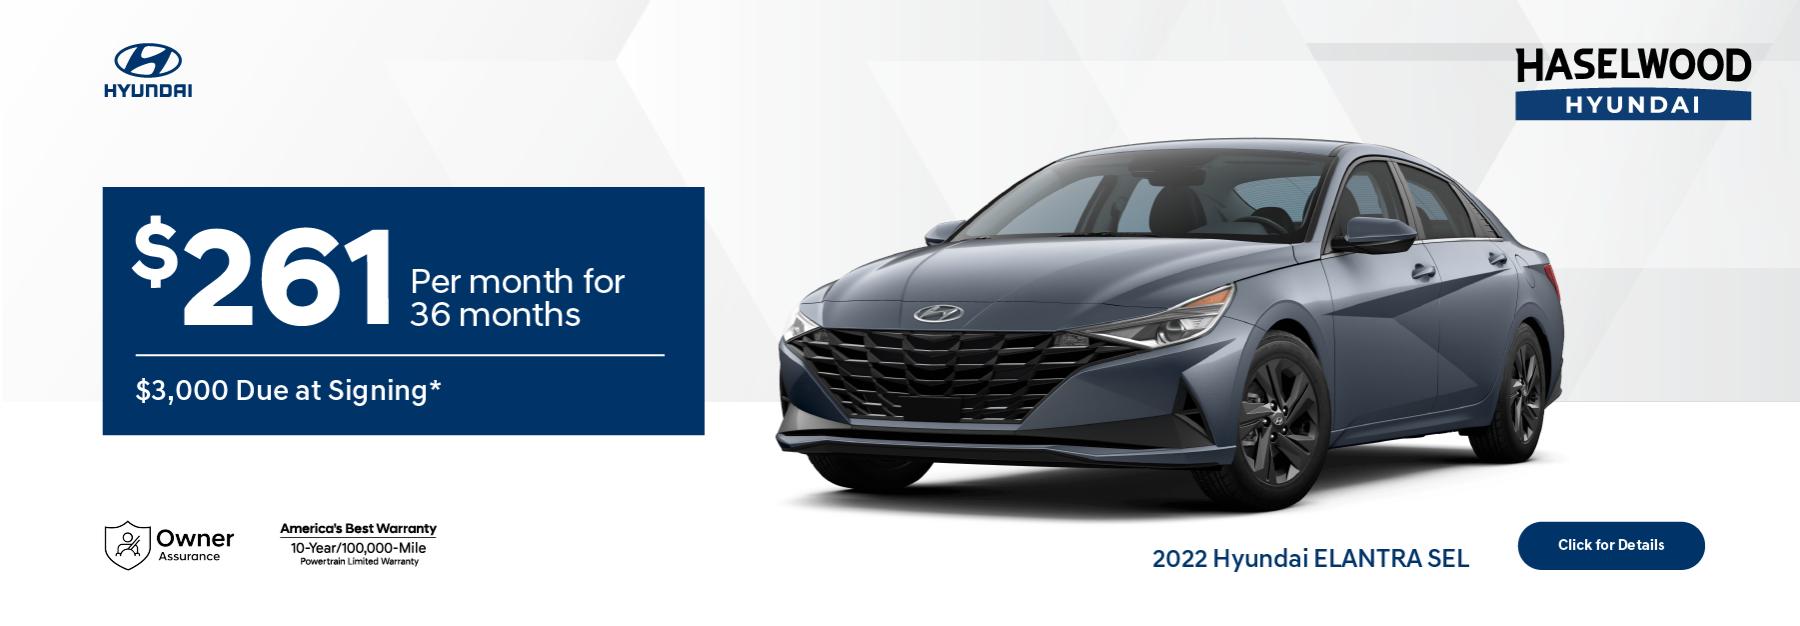 11768 – OCT21 – Hyundai Incentive – Web Slides_Elantra – Desktop